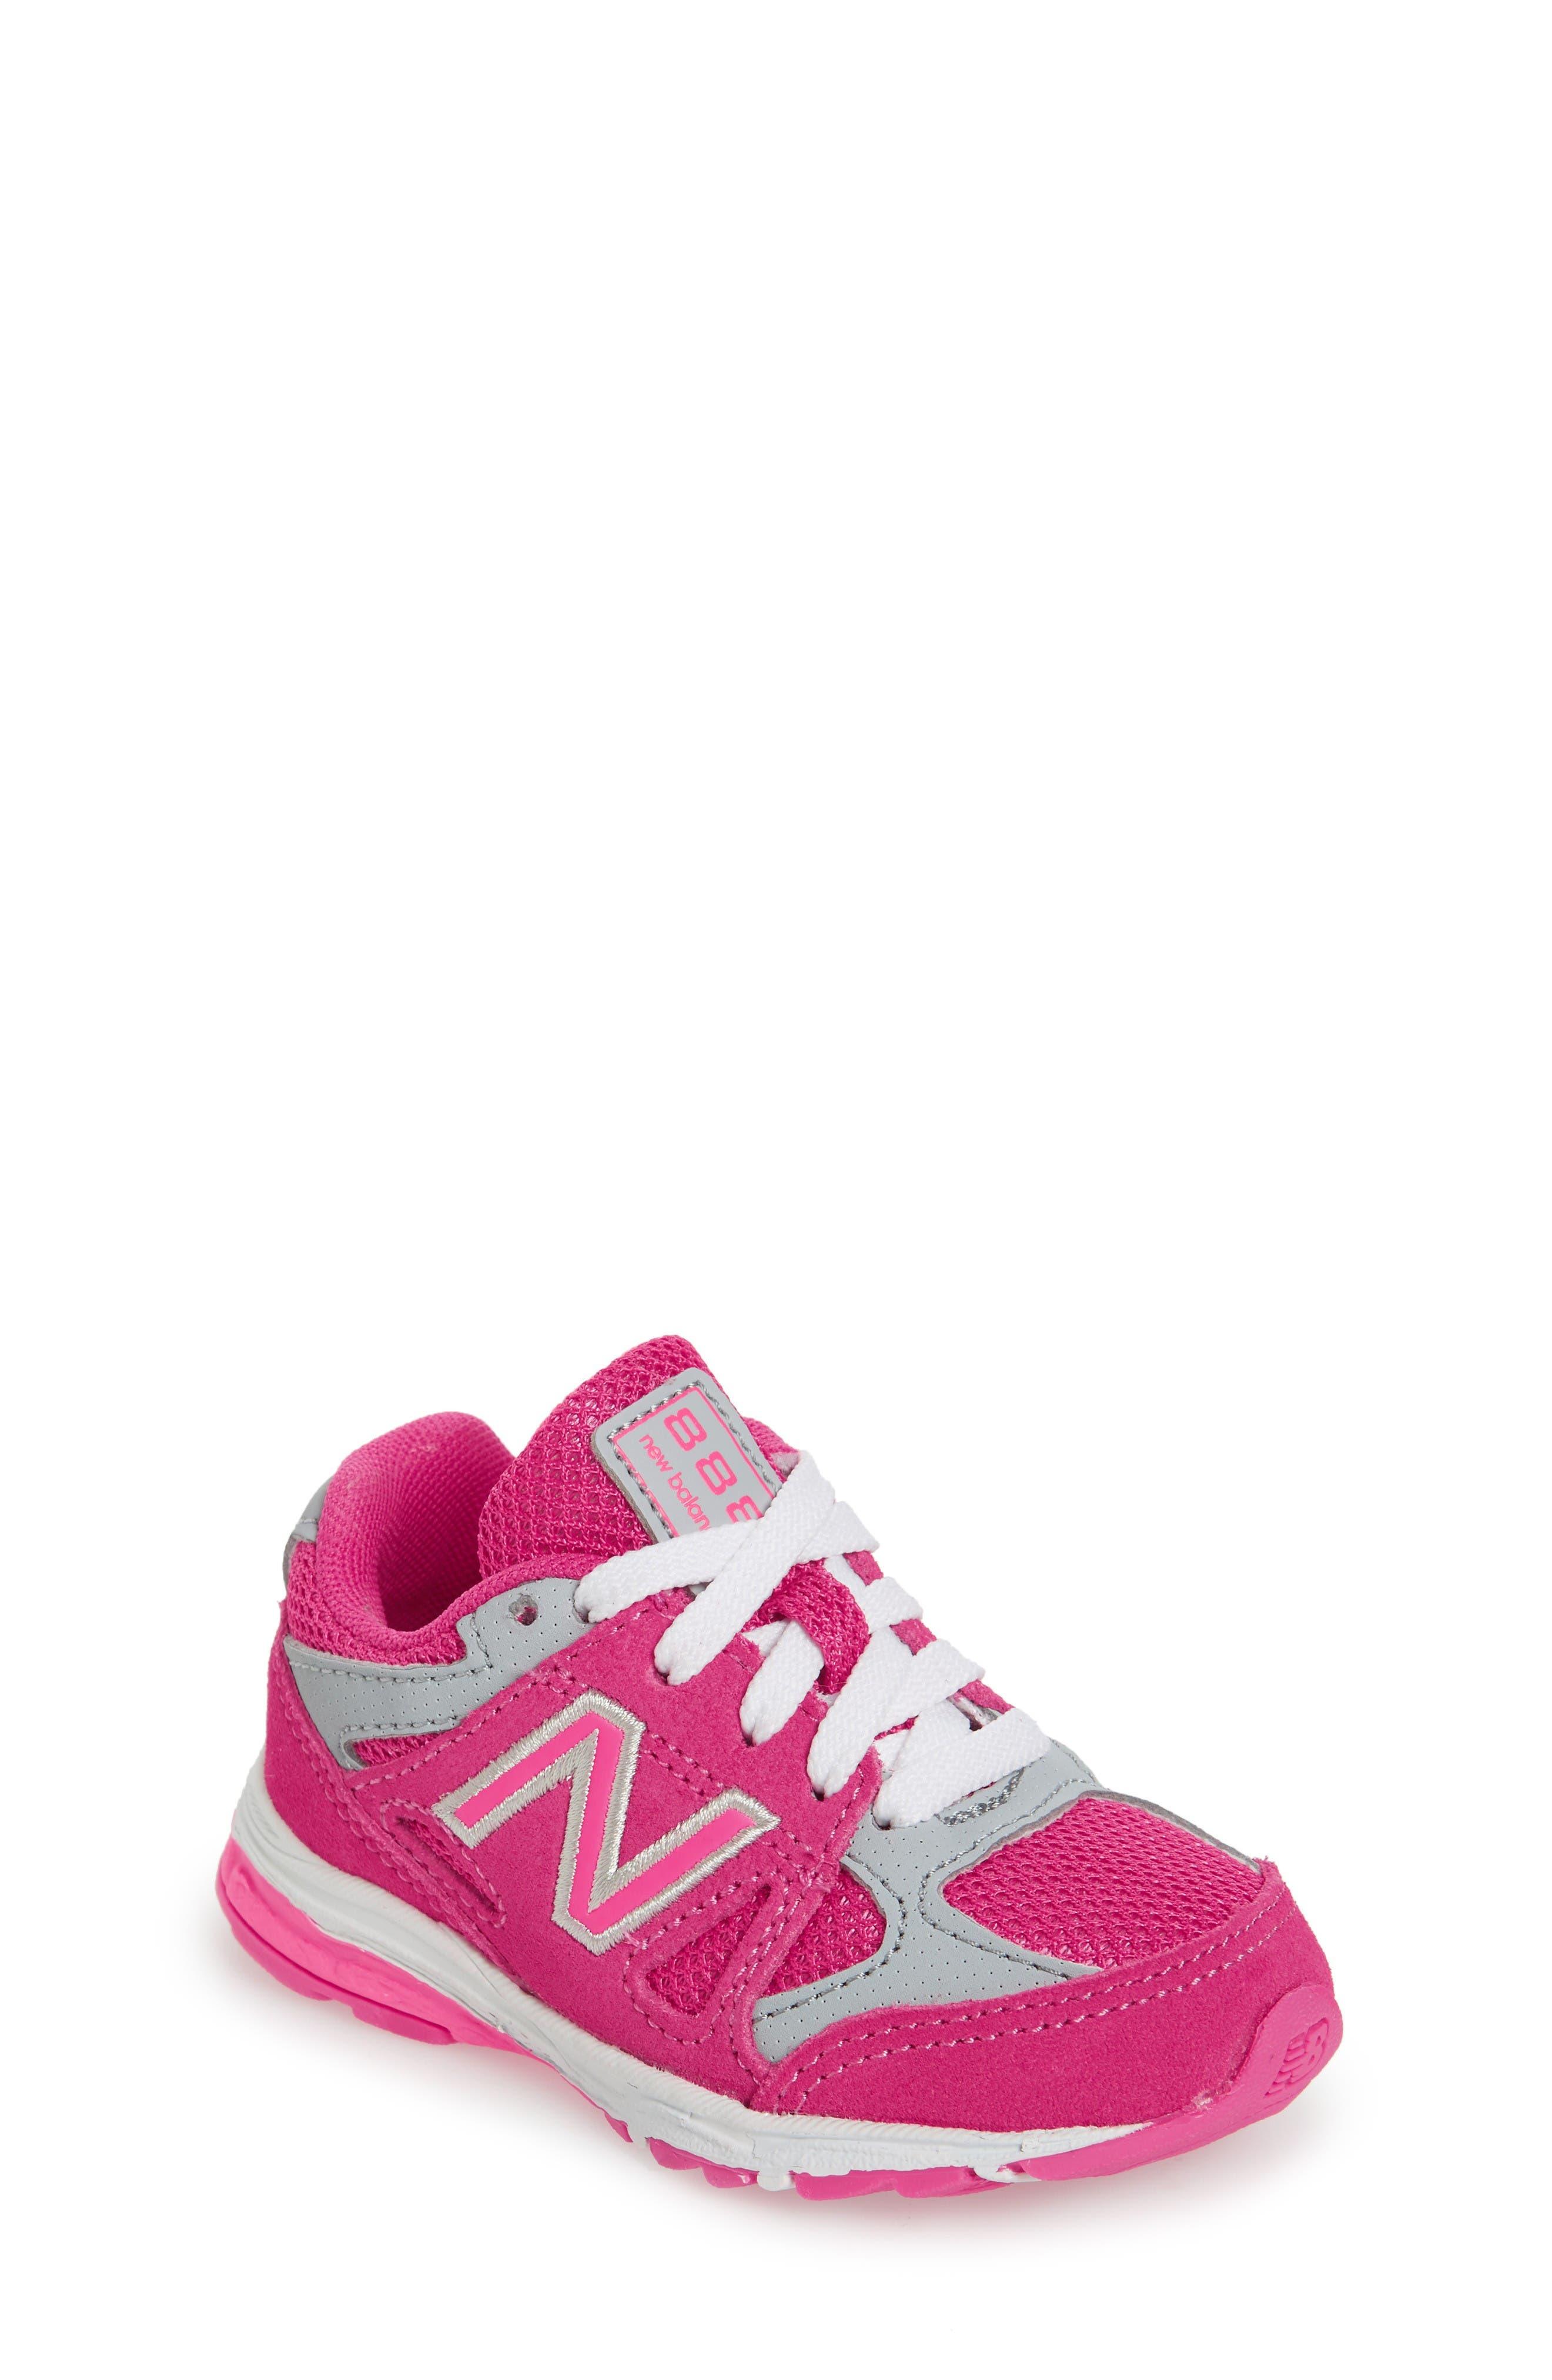 Alternate Image 1 Selected - New Balance 888 Sneaker (Baby, Walker, Toddler, Little Kid & Big Kid)